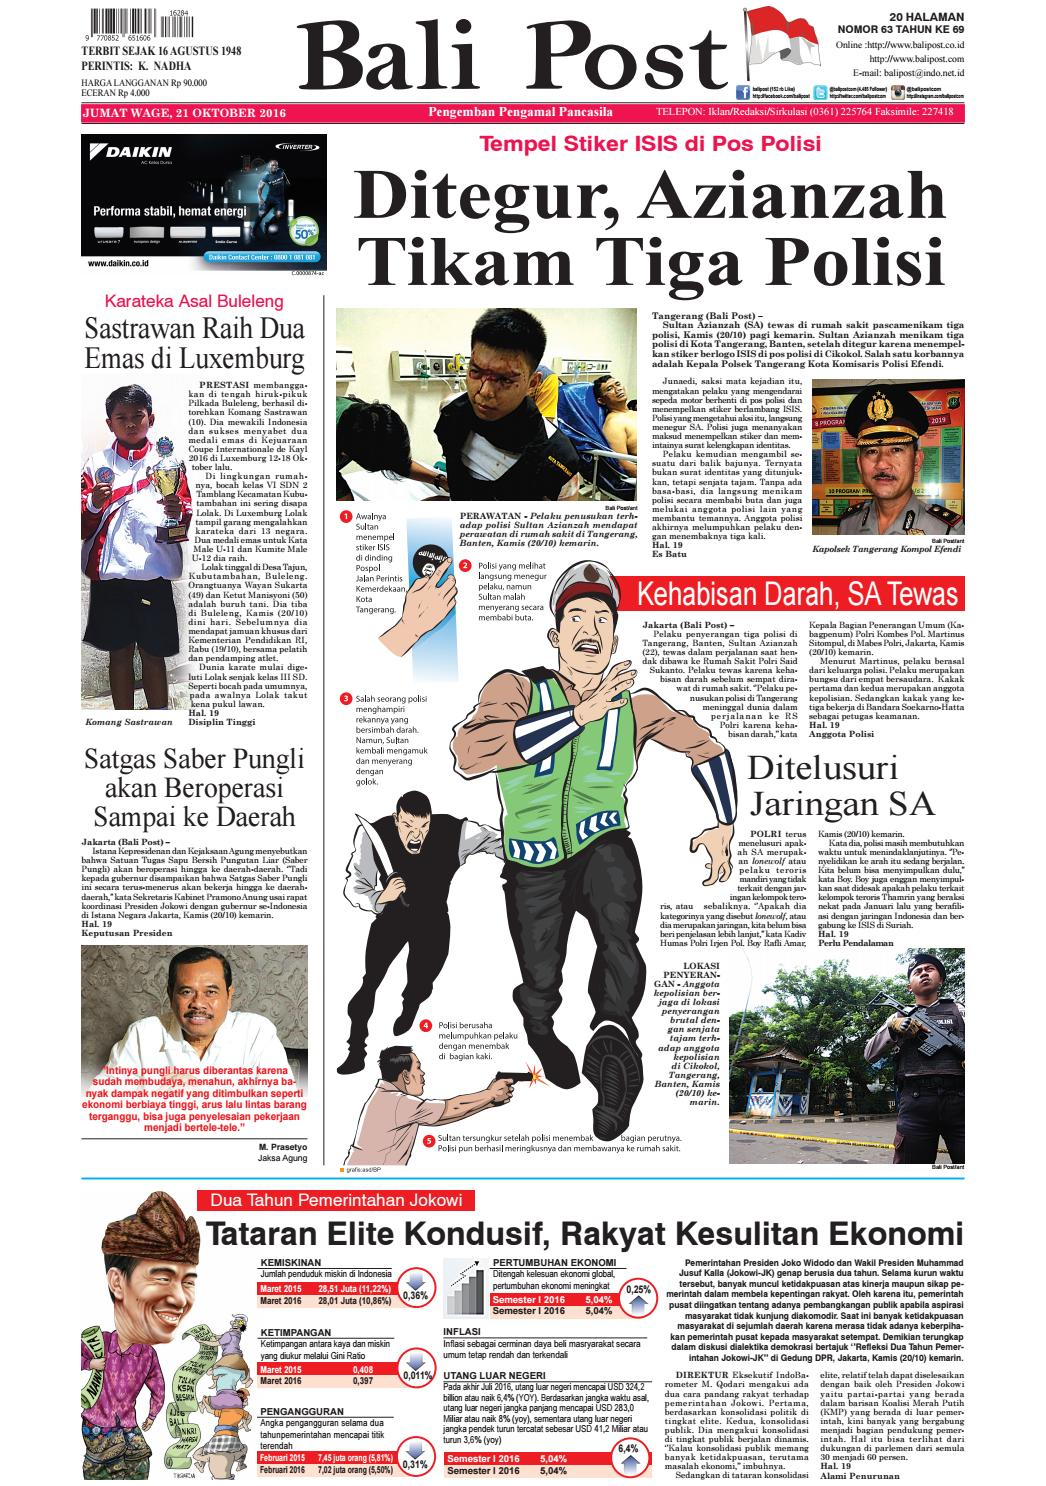 Edisi 21 Oktober 2016 Balipostcom By E Paper KMB Issuu